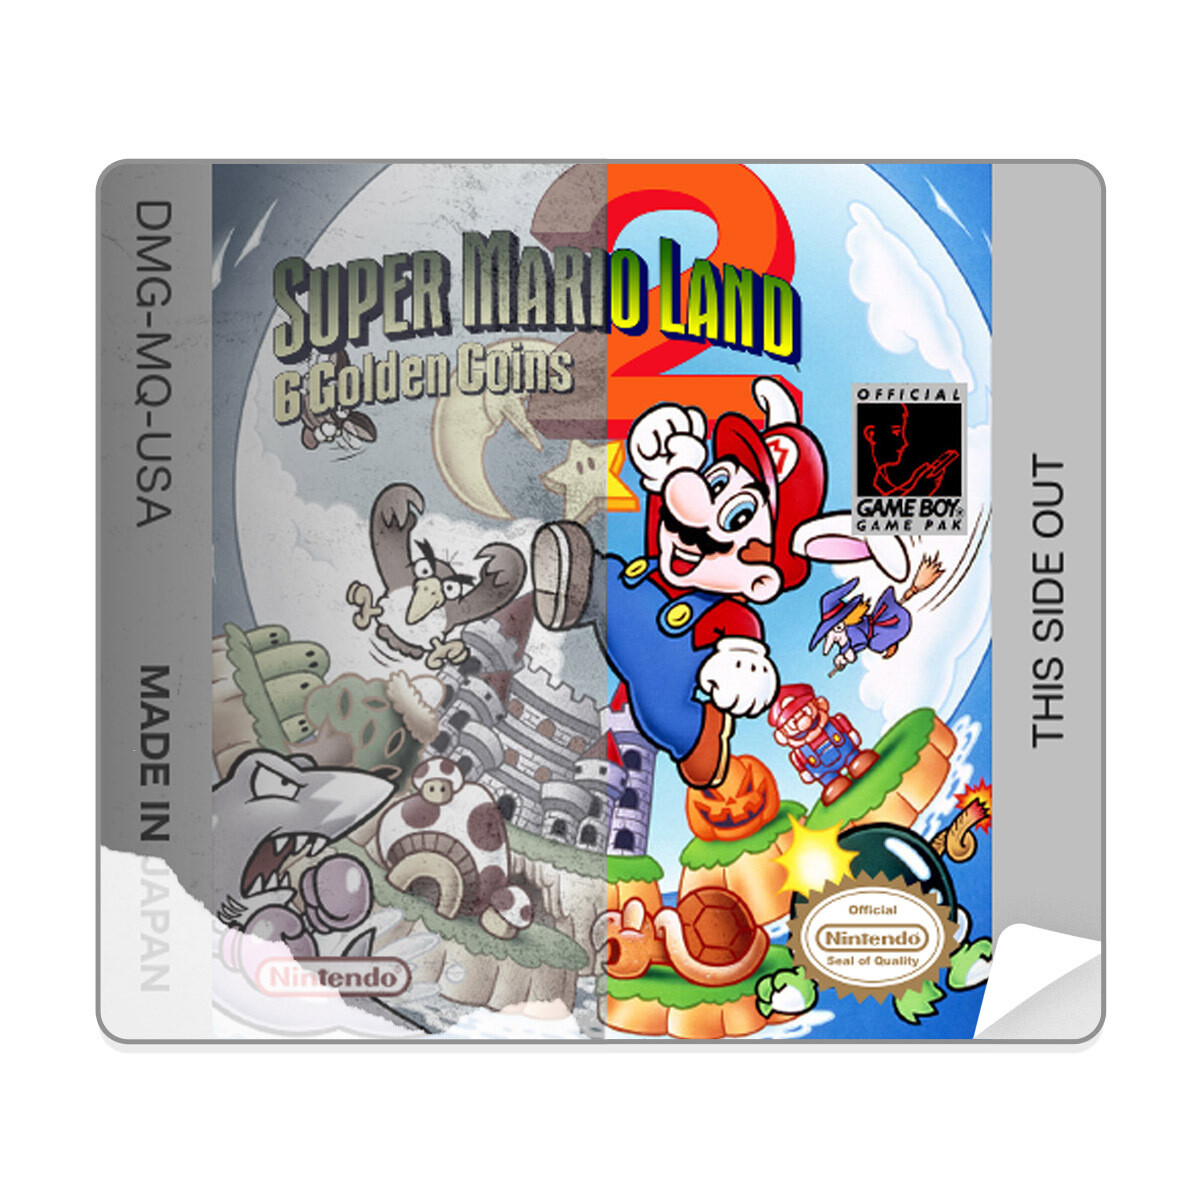 Game Boy Original Printed Sticker (Design Your Own)